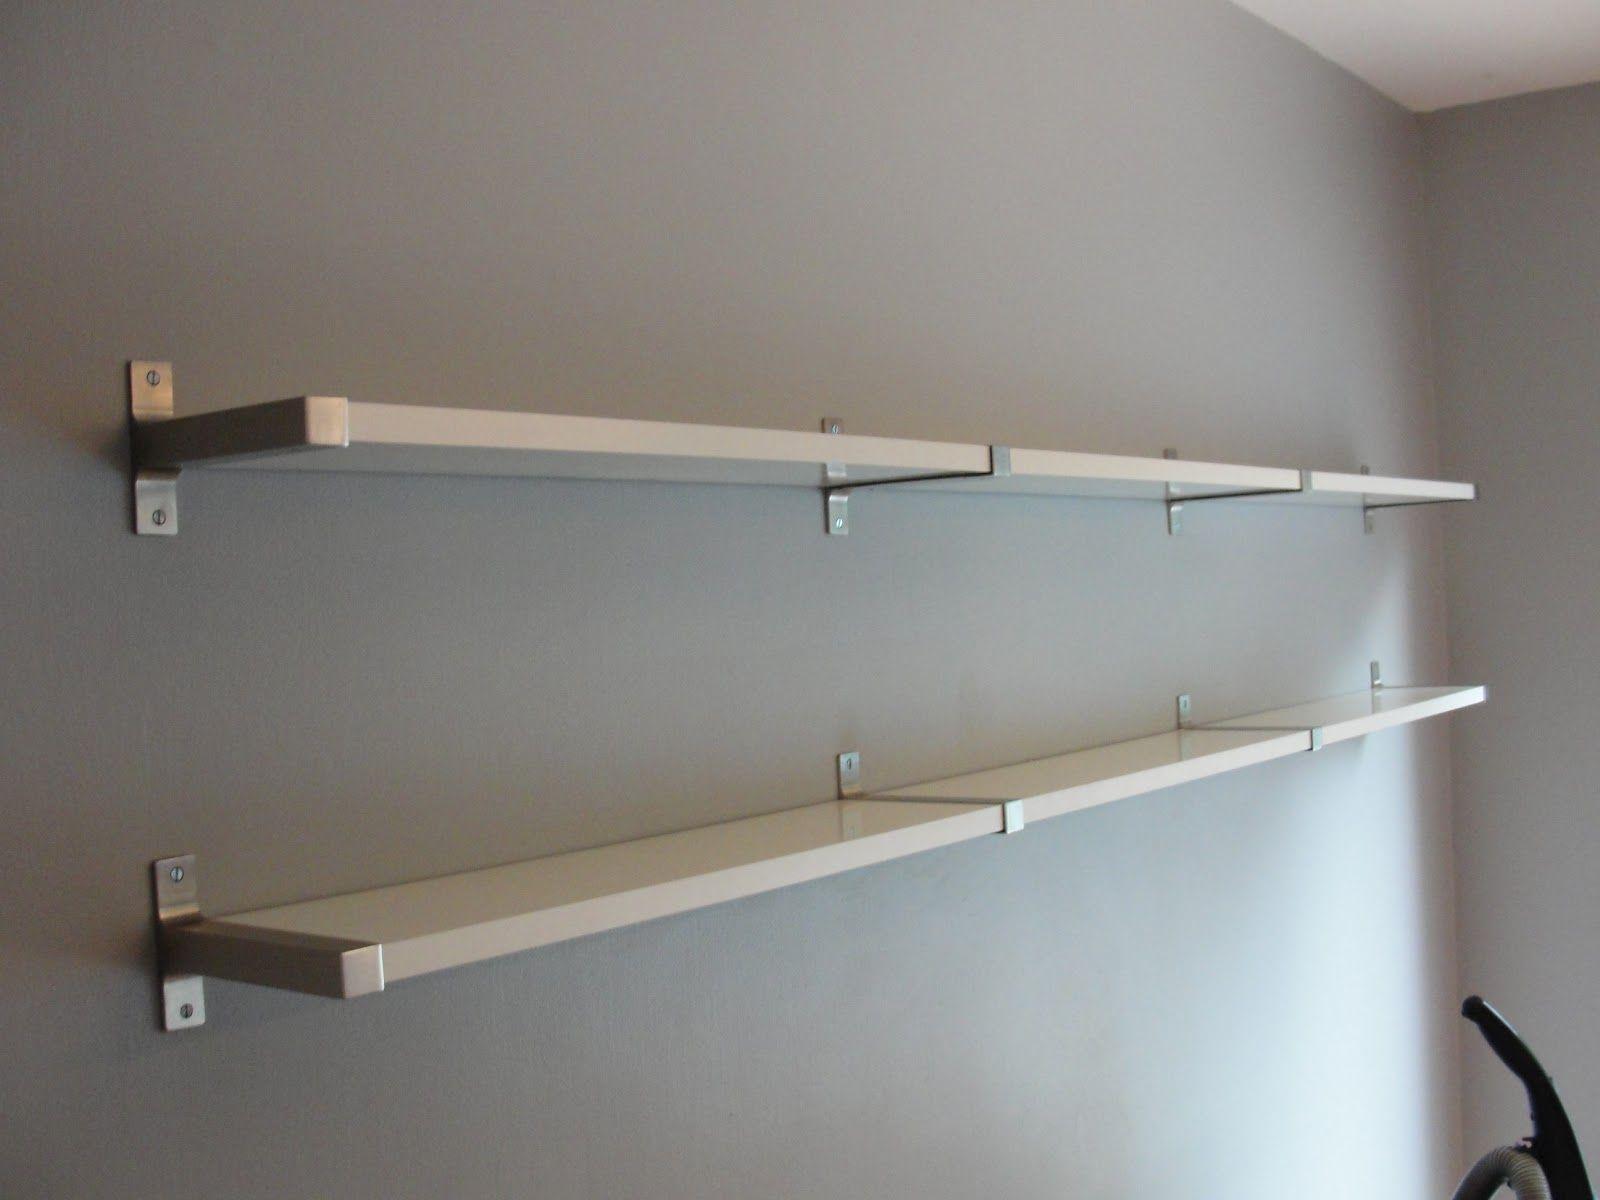 Furniture Design, Inspiring Cubicle Shelf Brackets With Gray Wall ...